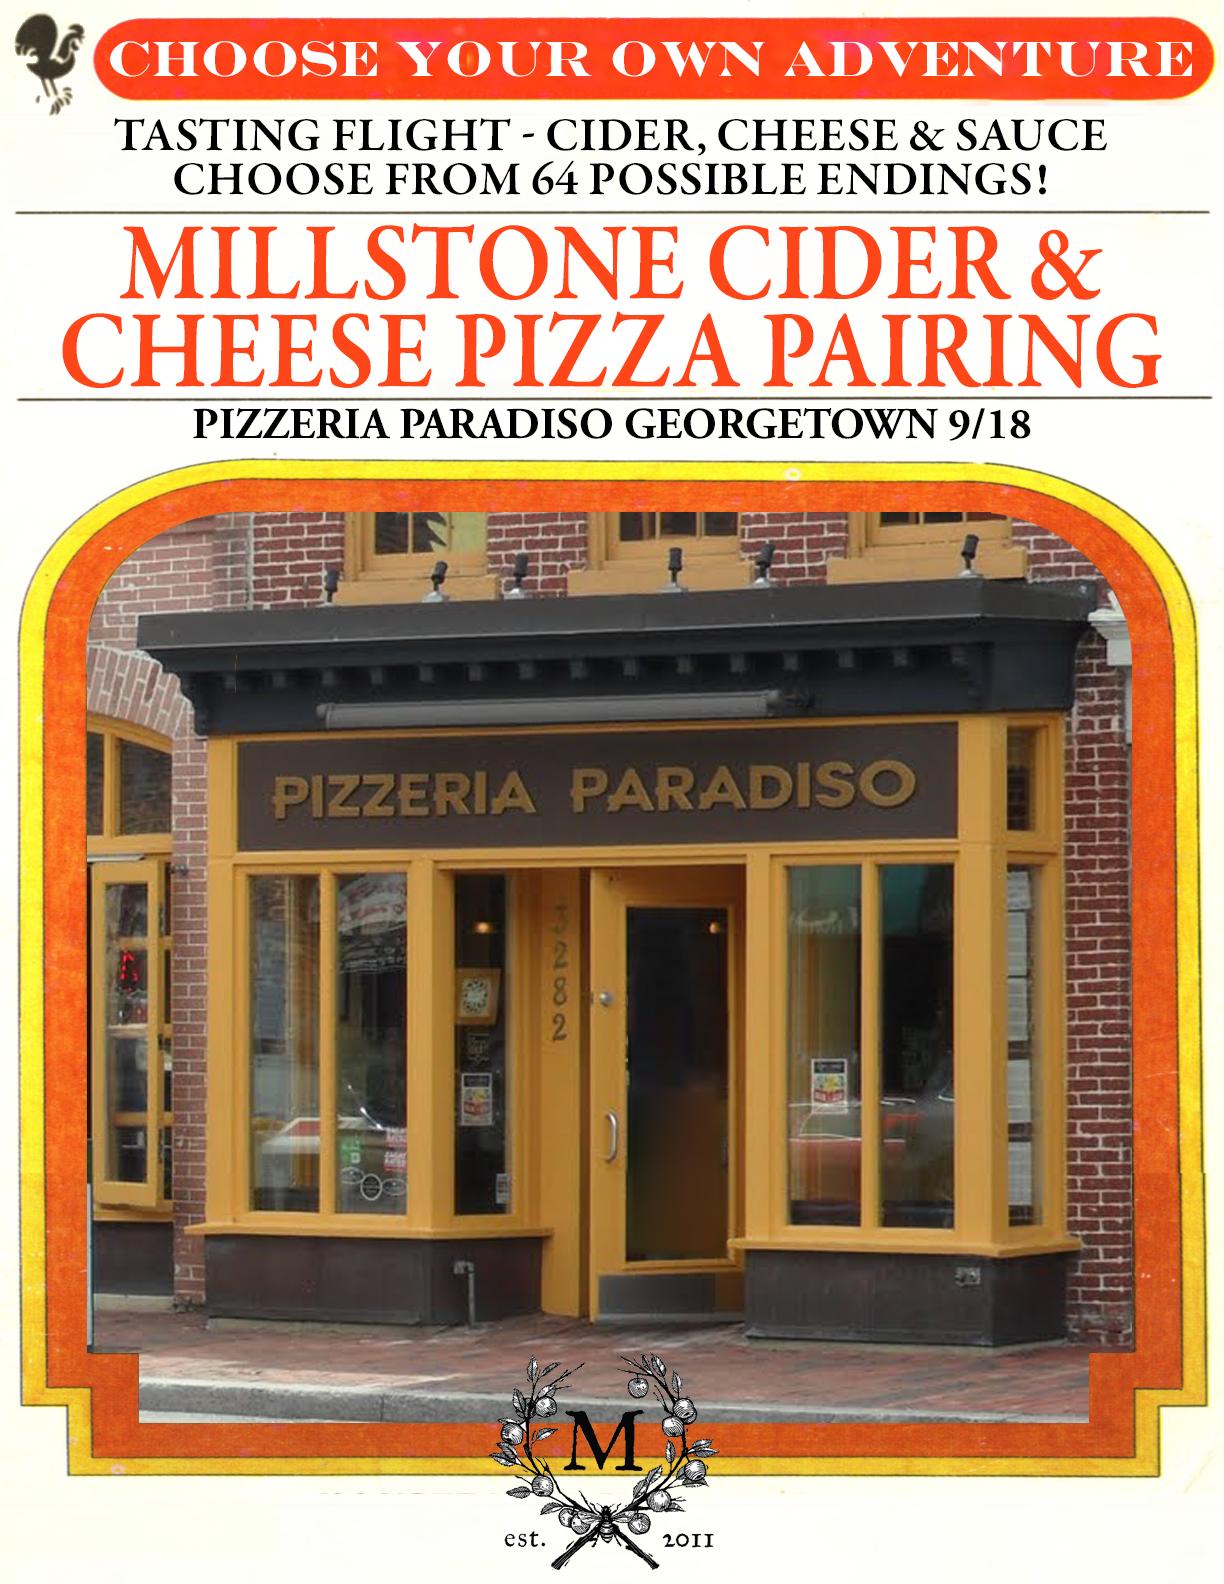 millstone-cider-pairing-2015-6-without-orange-box.png